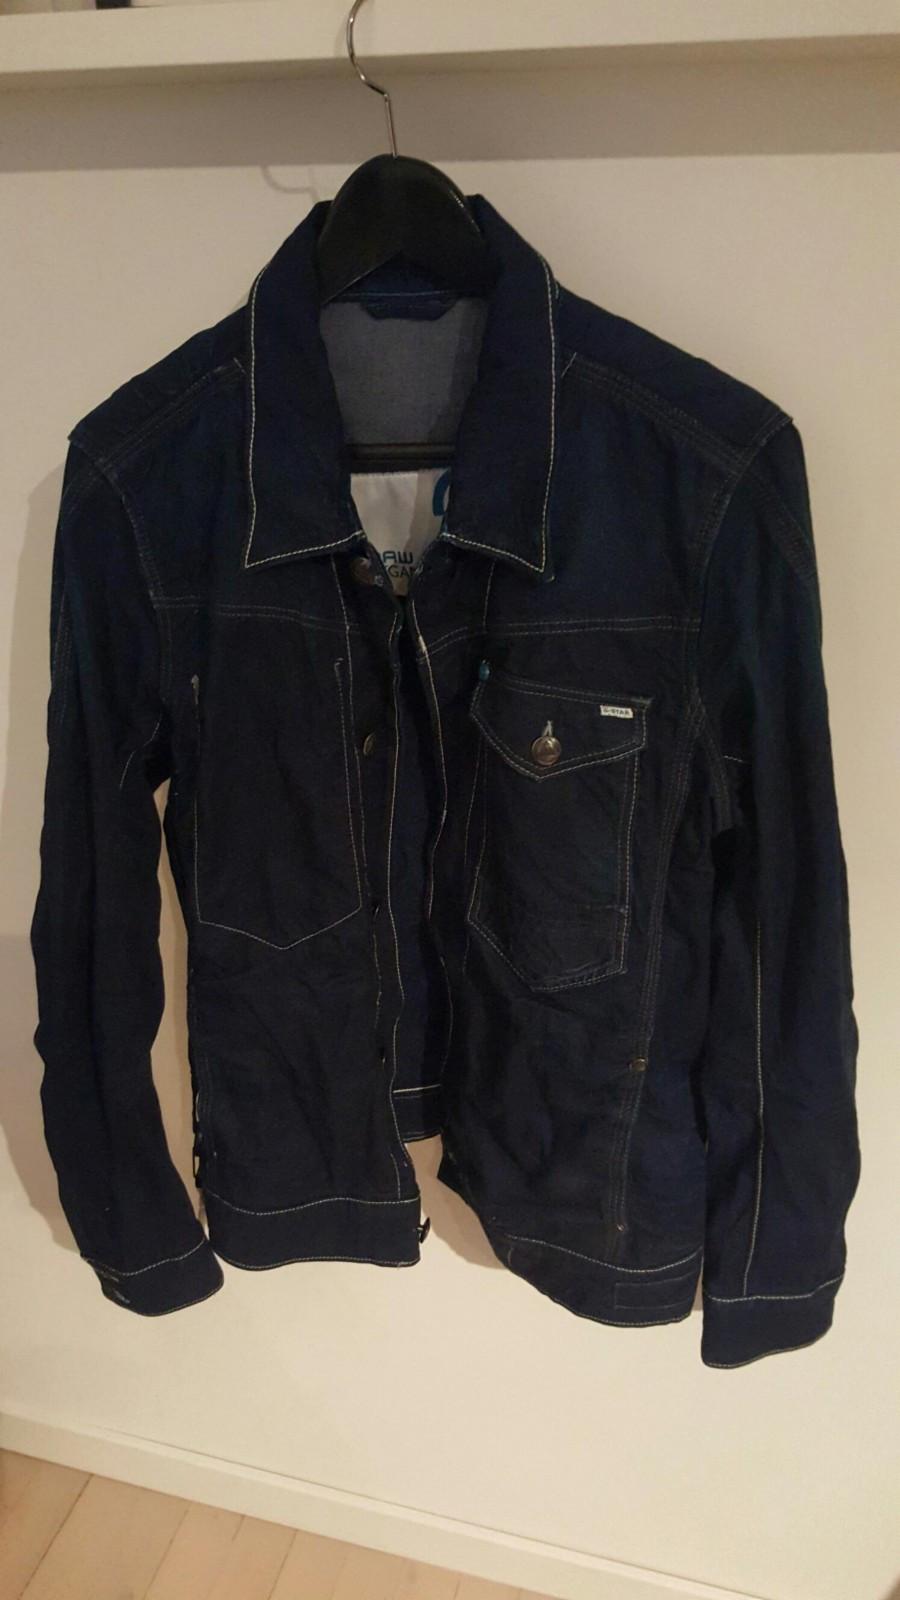 G Star jakke (ubrukt) Strl XL